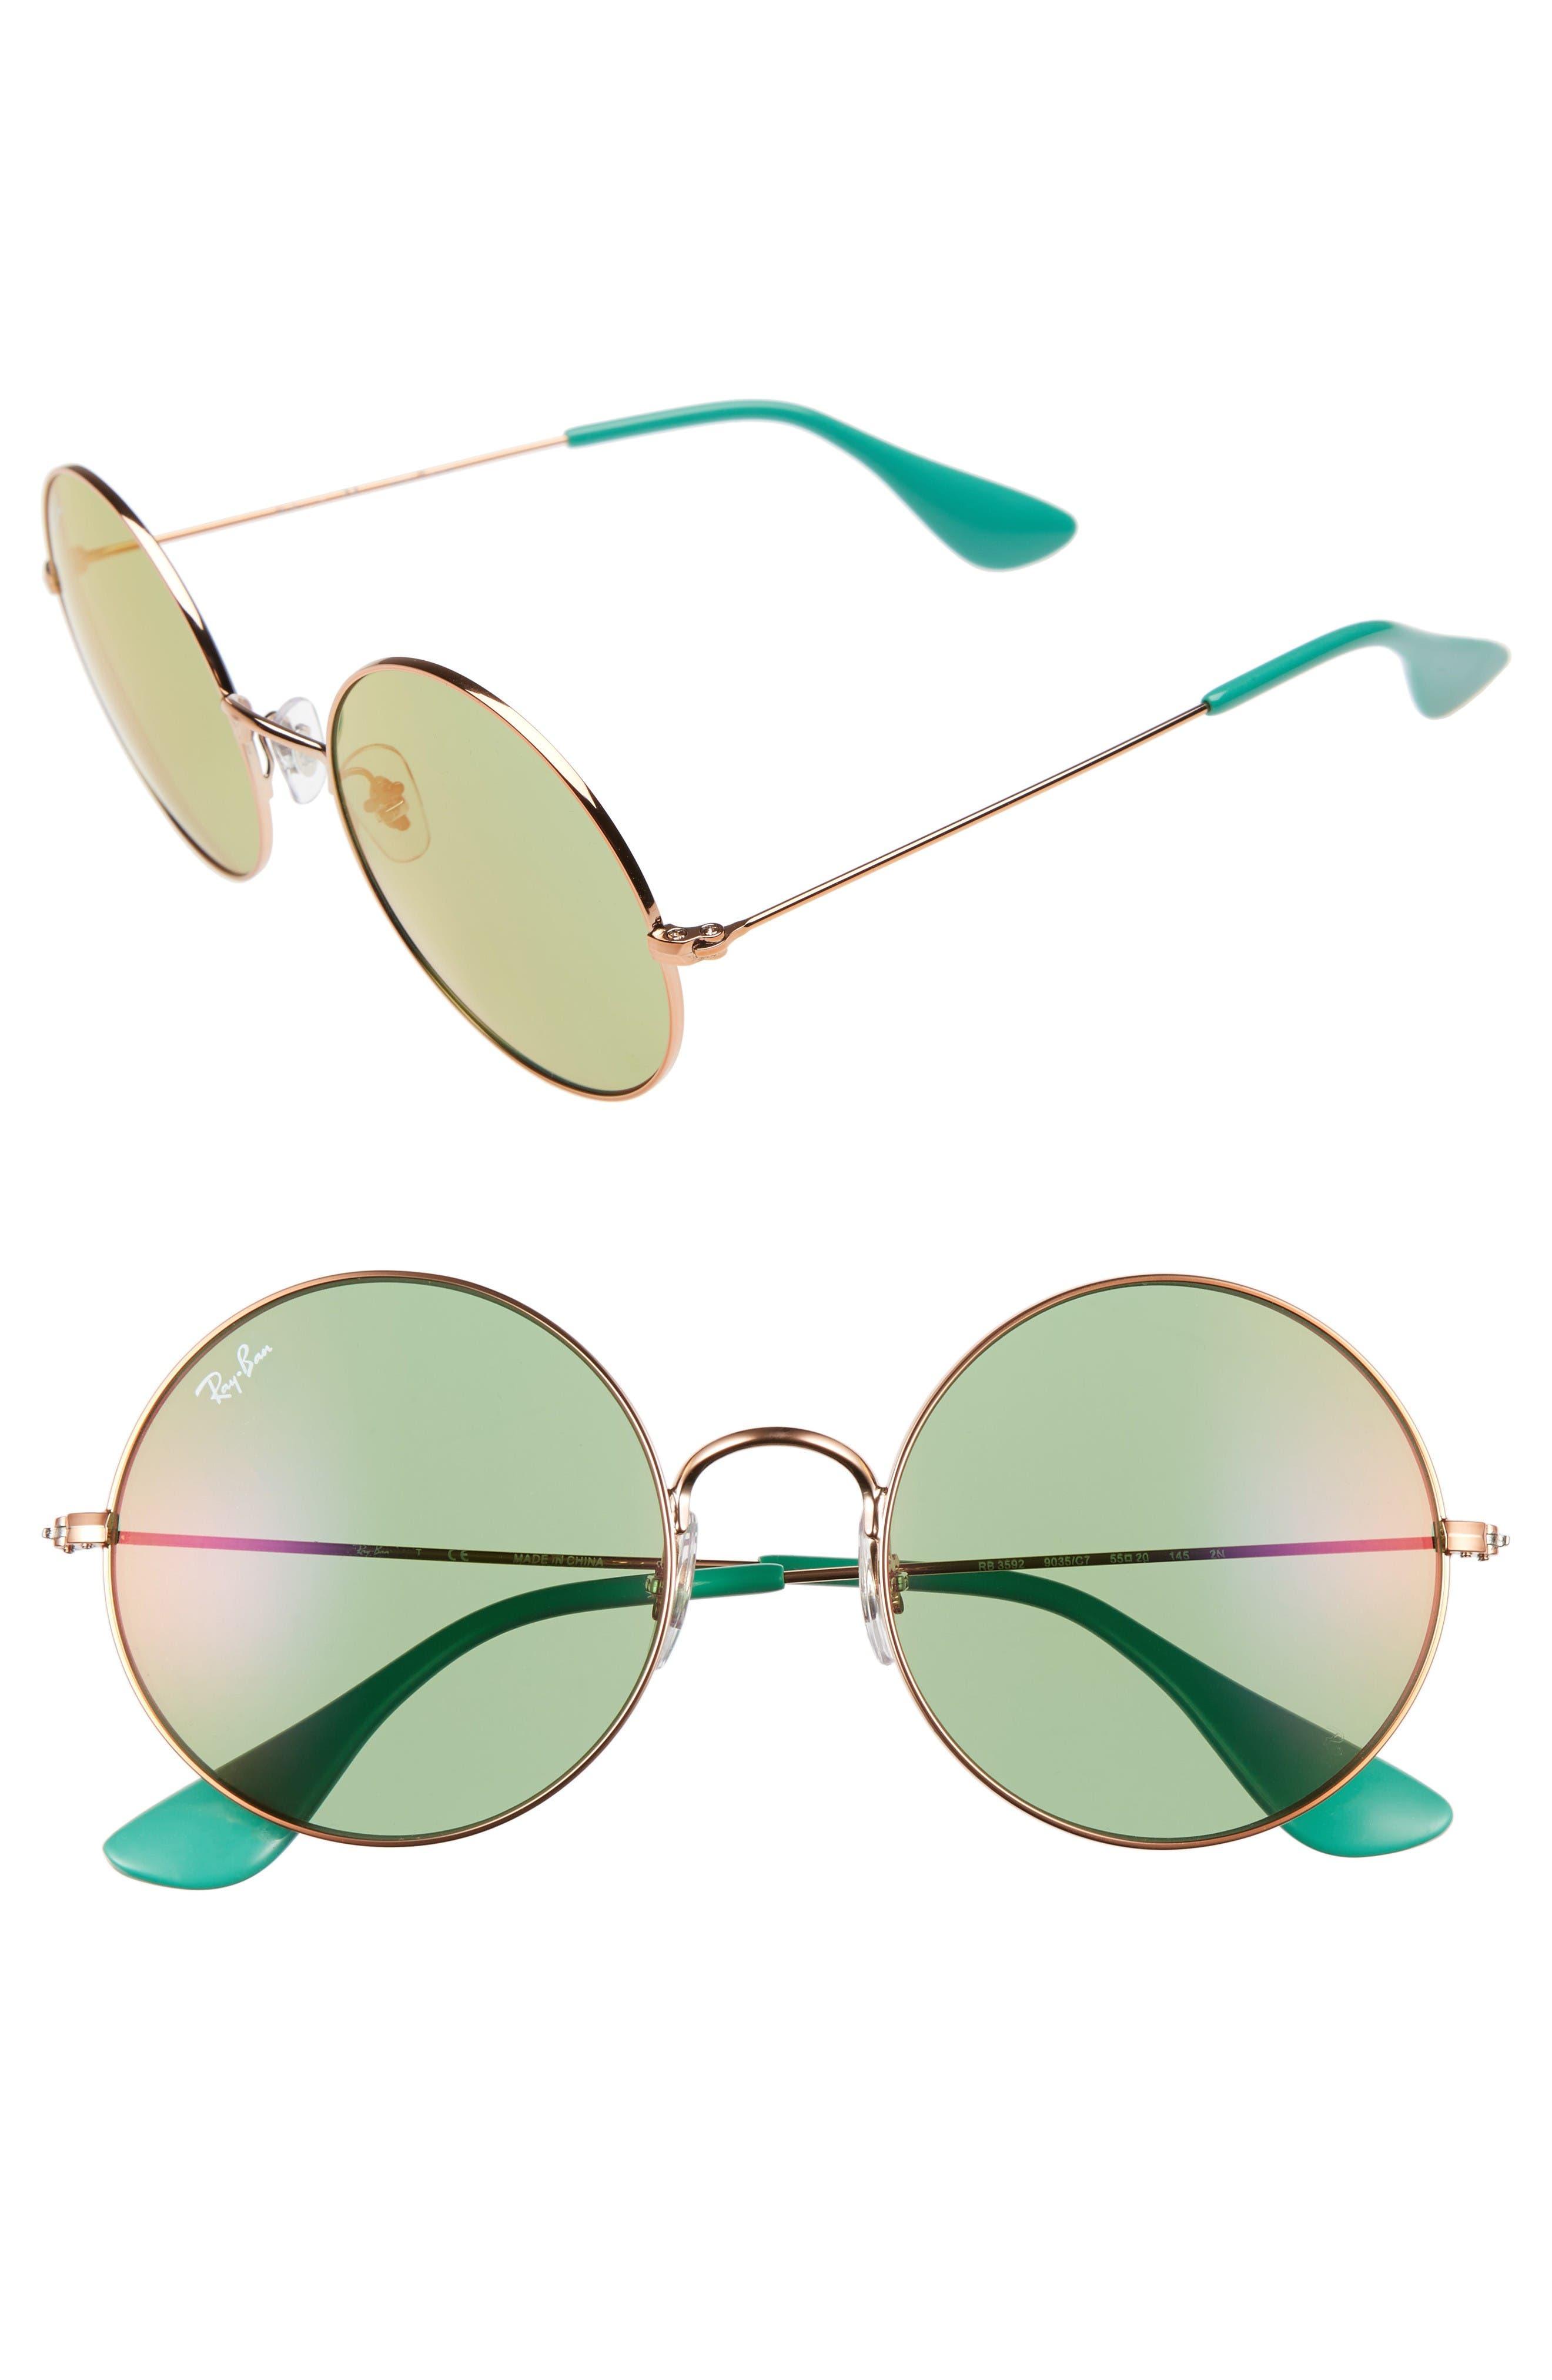 Ray-Ban The Ja-Jo 55mm Round Sunglasses